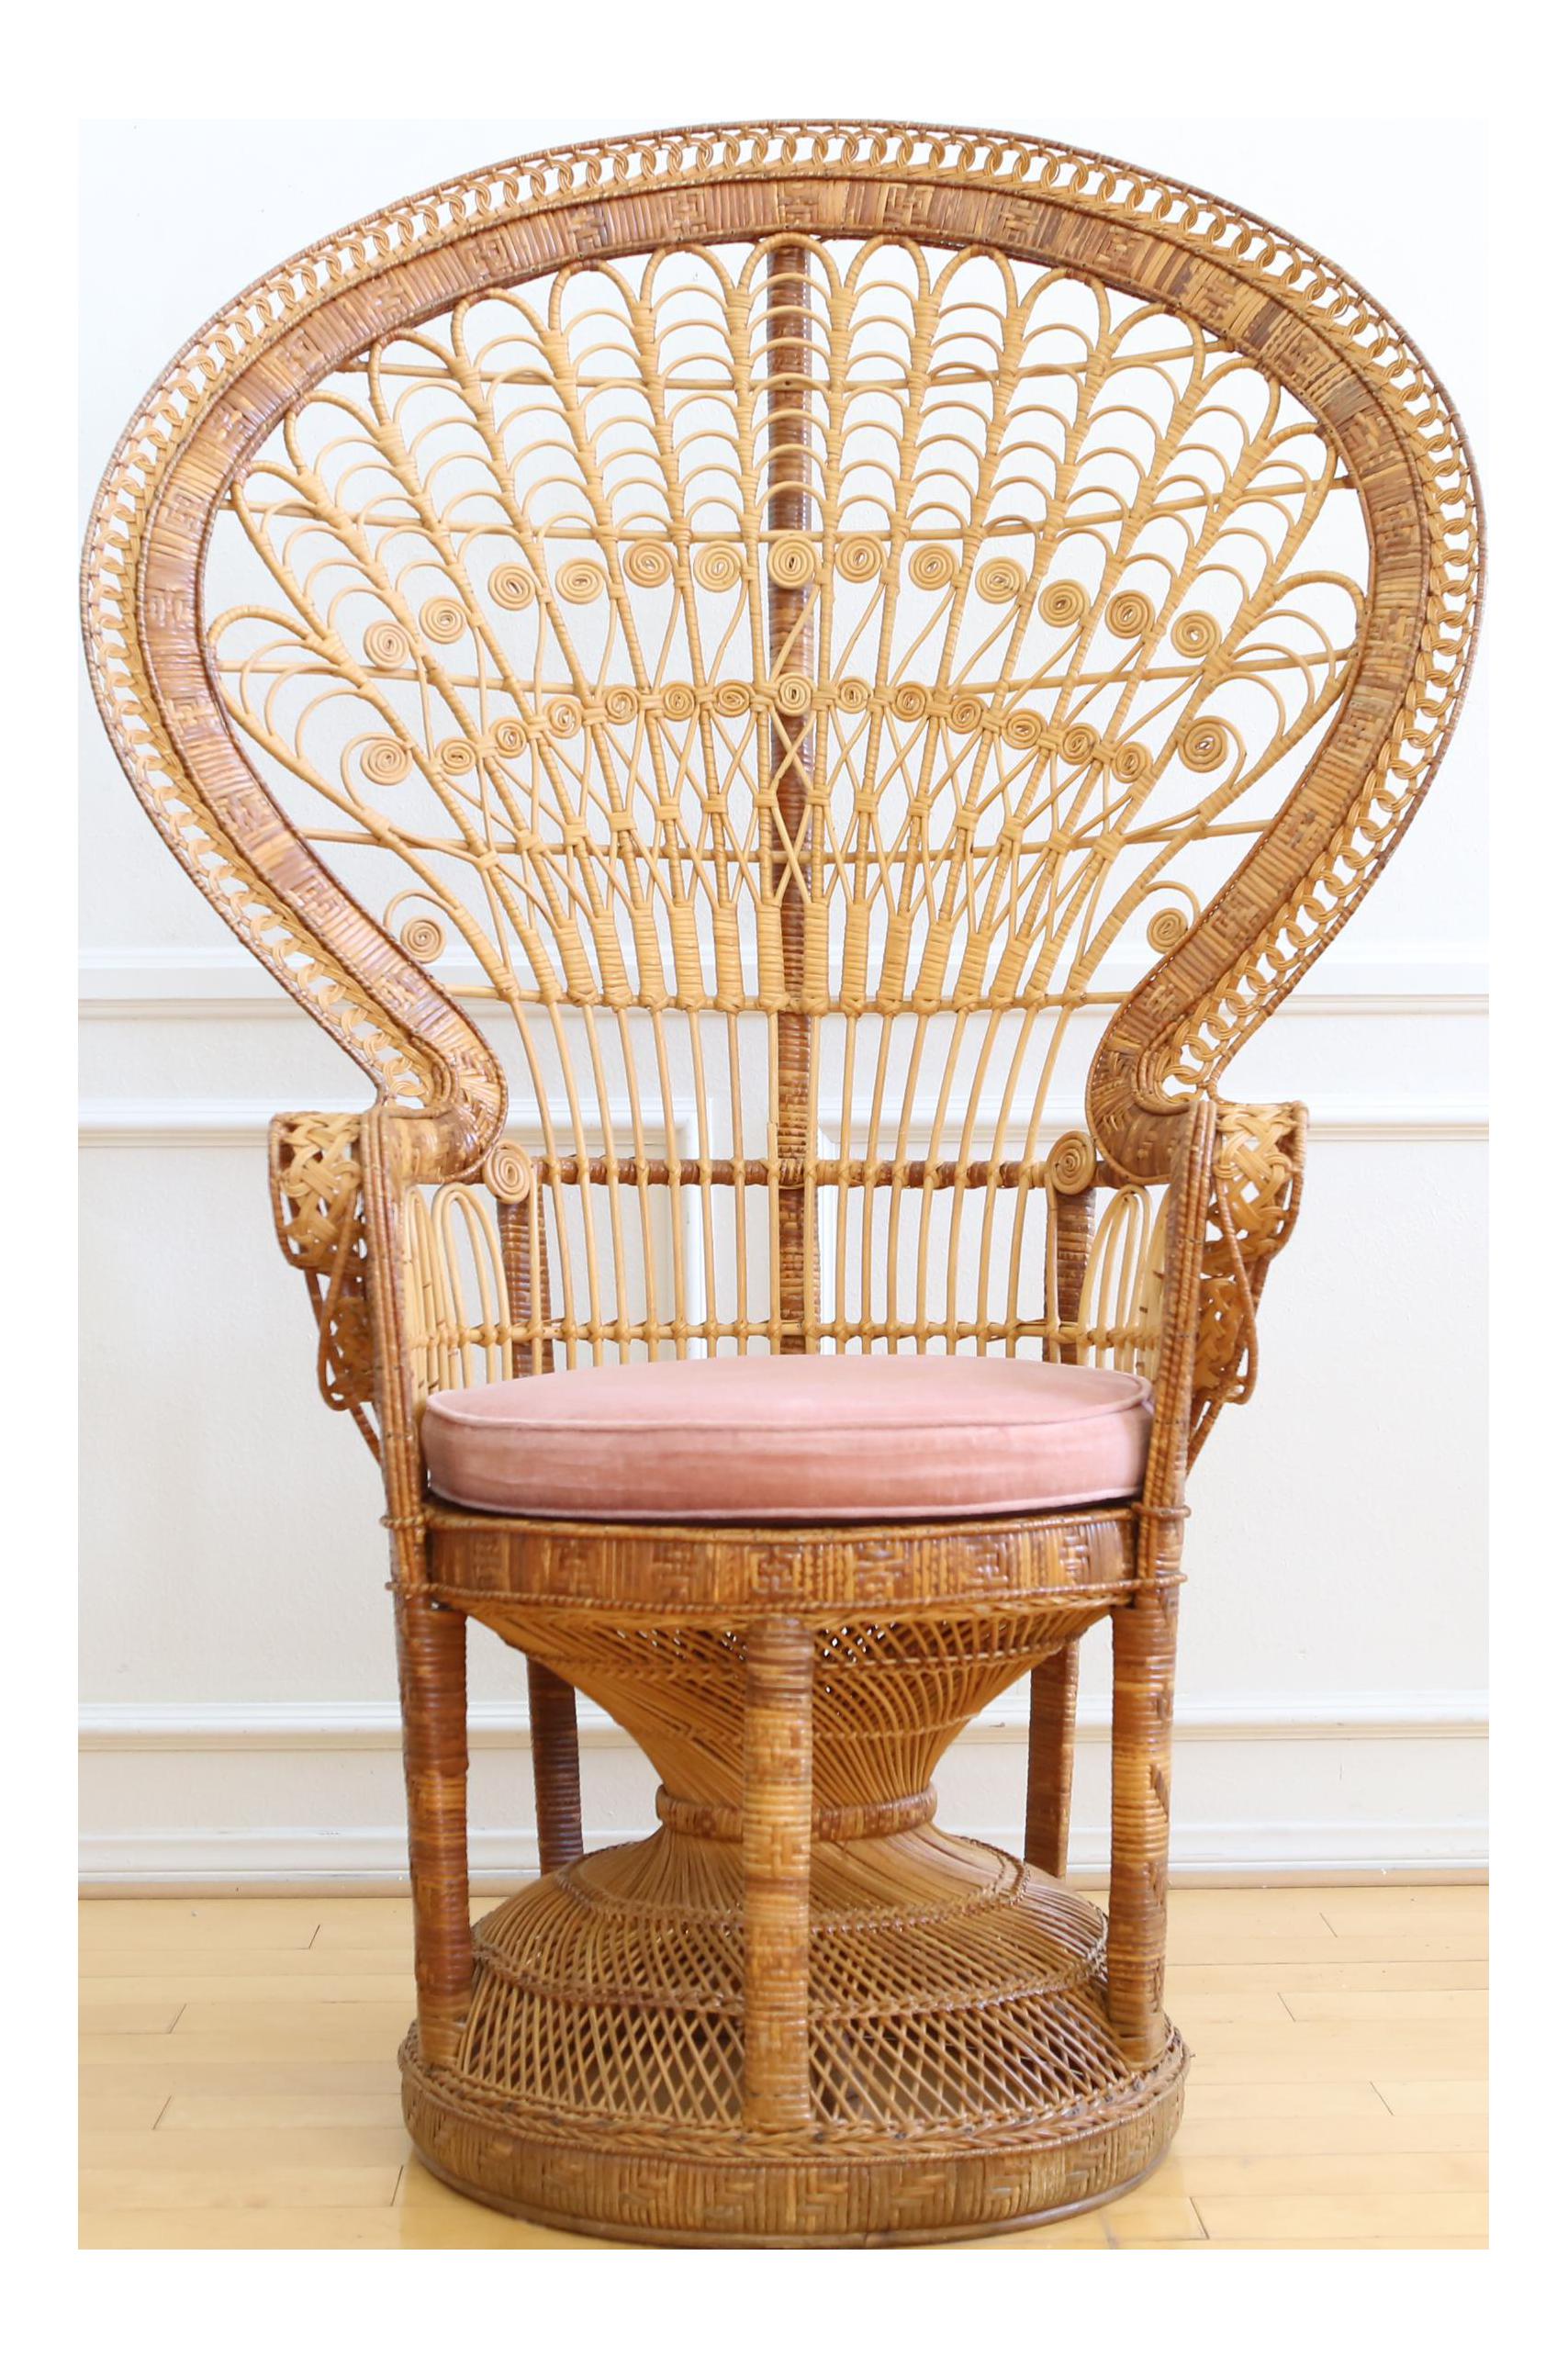 Vintage rattan chair - Vintage Rattan Chair 23